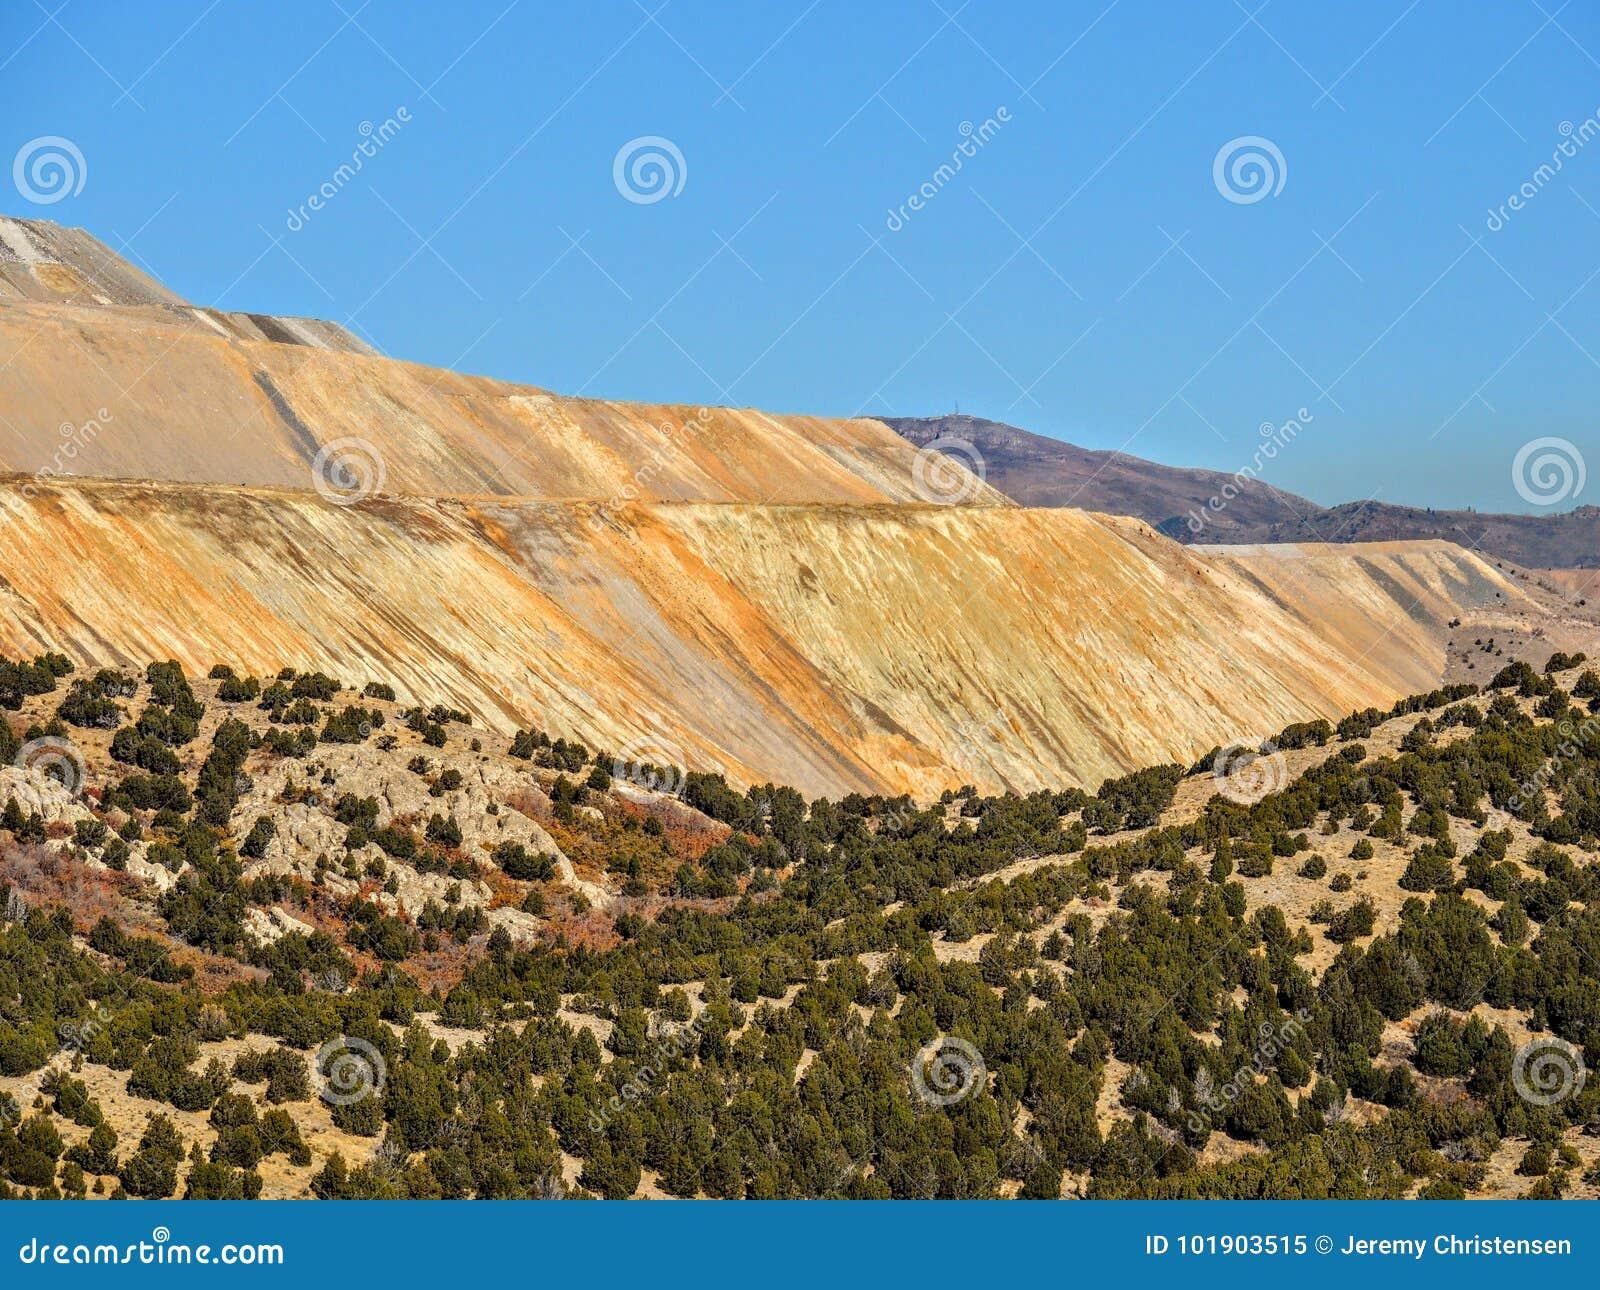 Ansicht Bingham Copper Mine Mountainss in Autumn Fall, der Rose Canyon Yellow Fork wandert, großer Felsen und Waterfork-Schleife